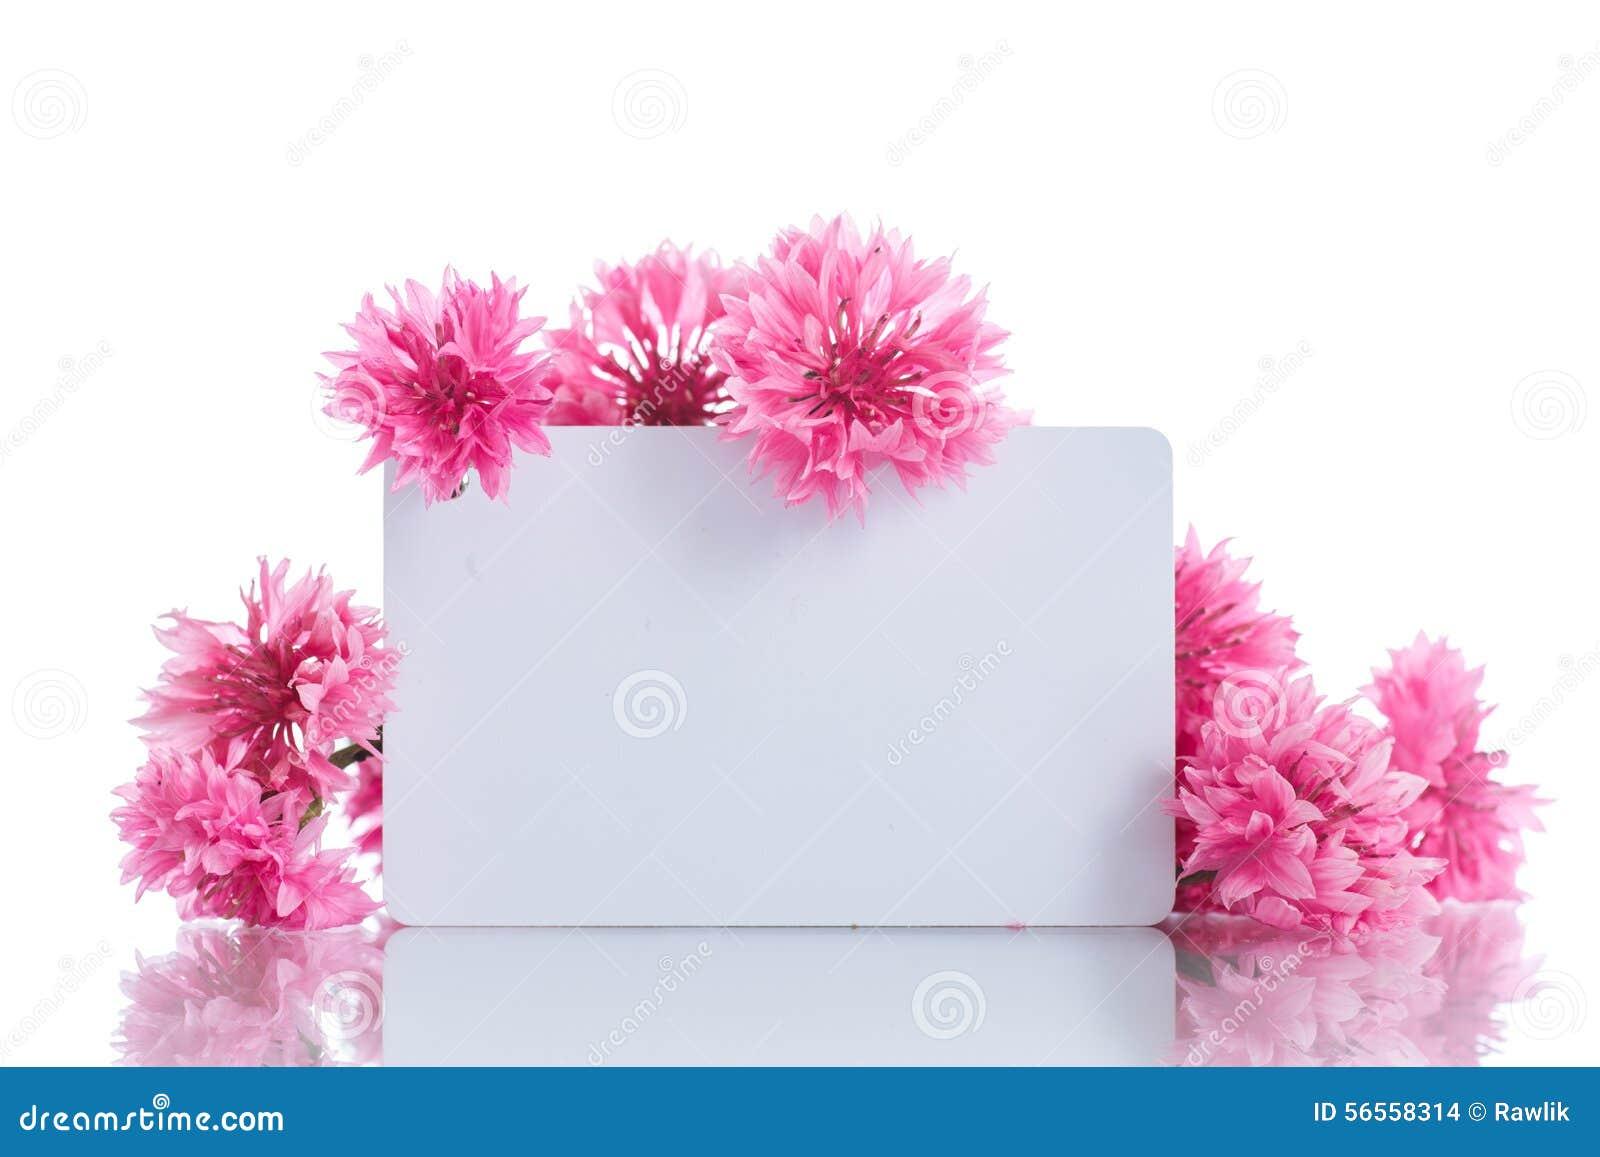 Download Φωτεινή ανθοδέσμη των γαρίφαλων Στοκ Εικόνες - εικόνα από λουλούδι, απομονωμένος: 56558314